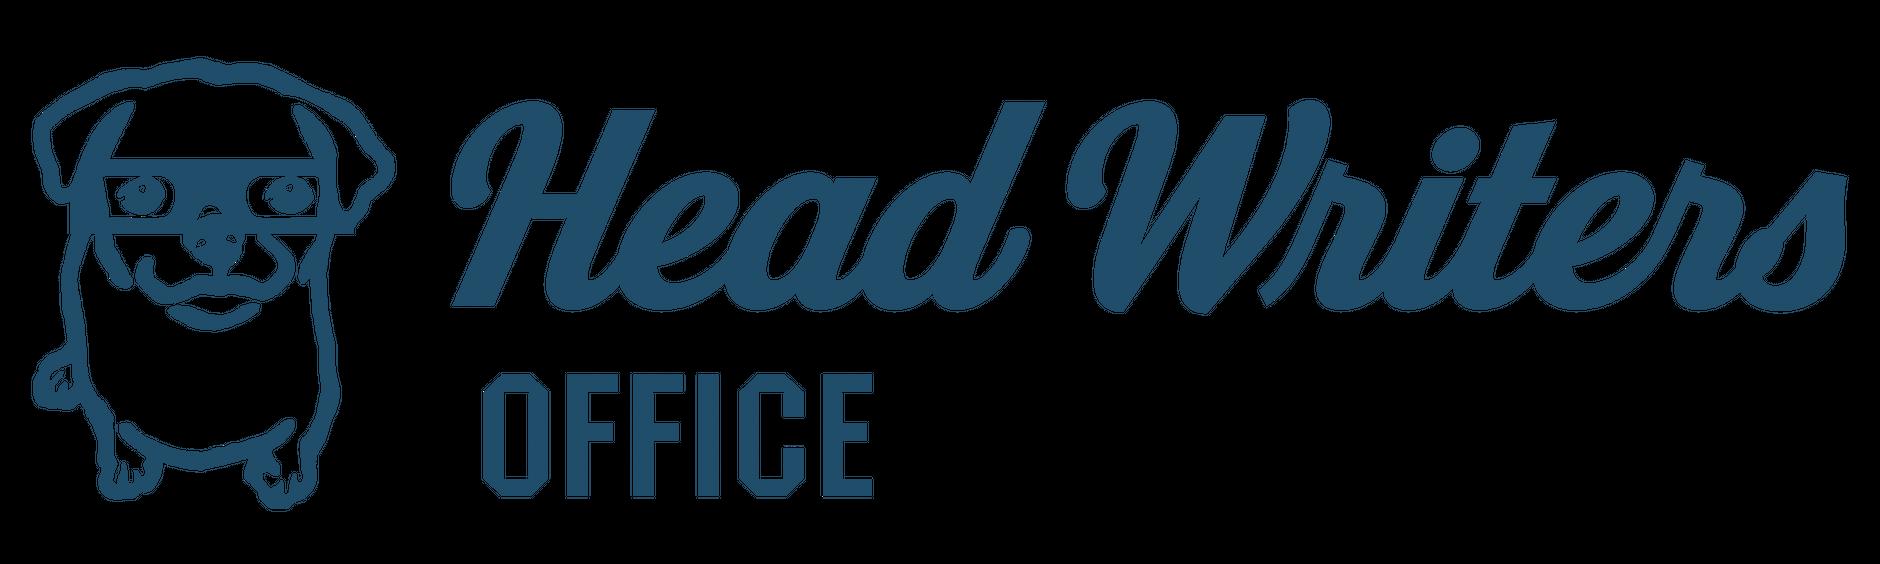 Head Writers Office STORE